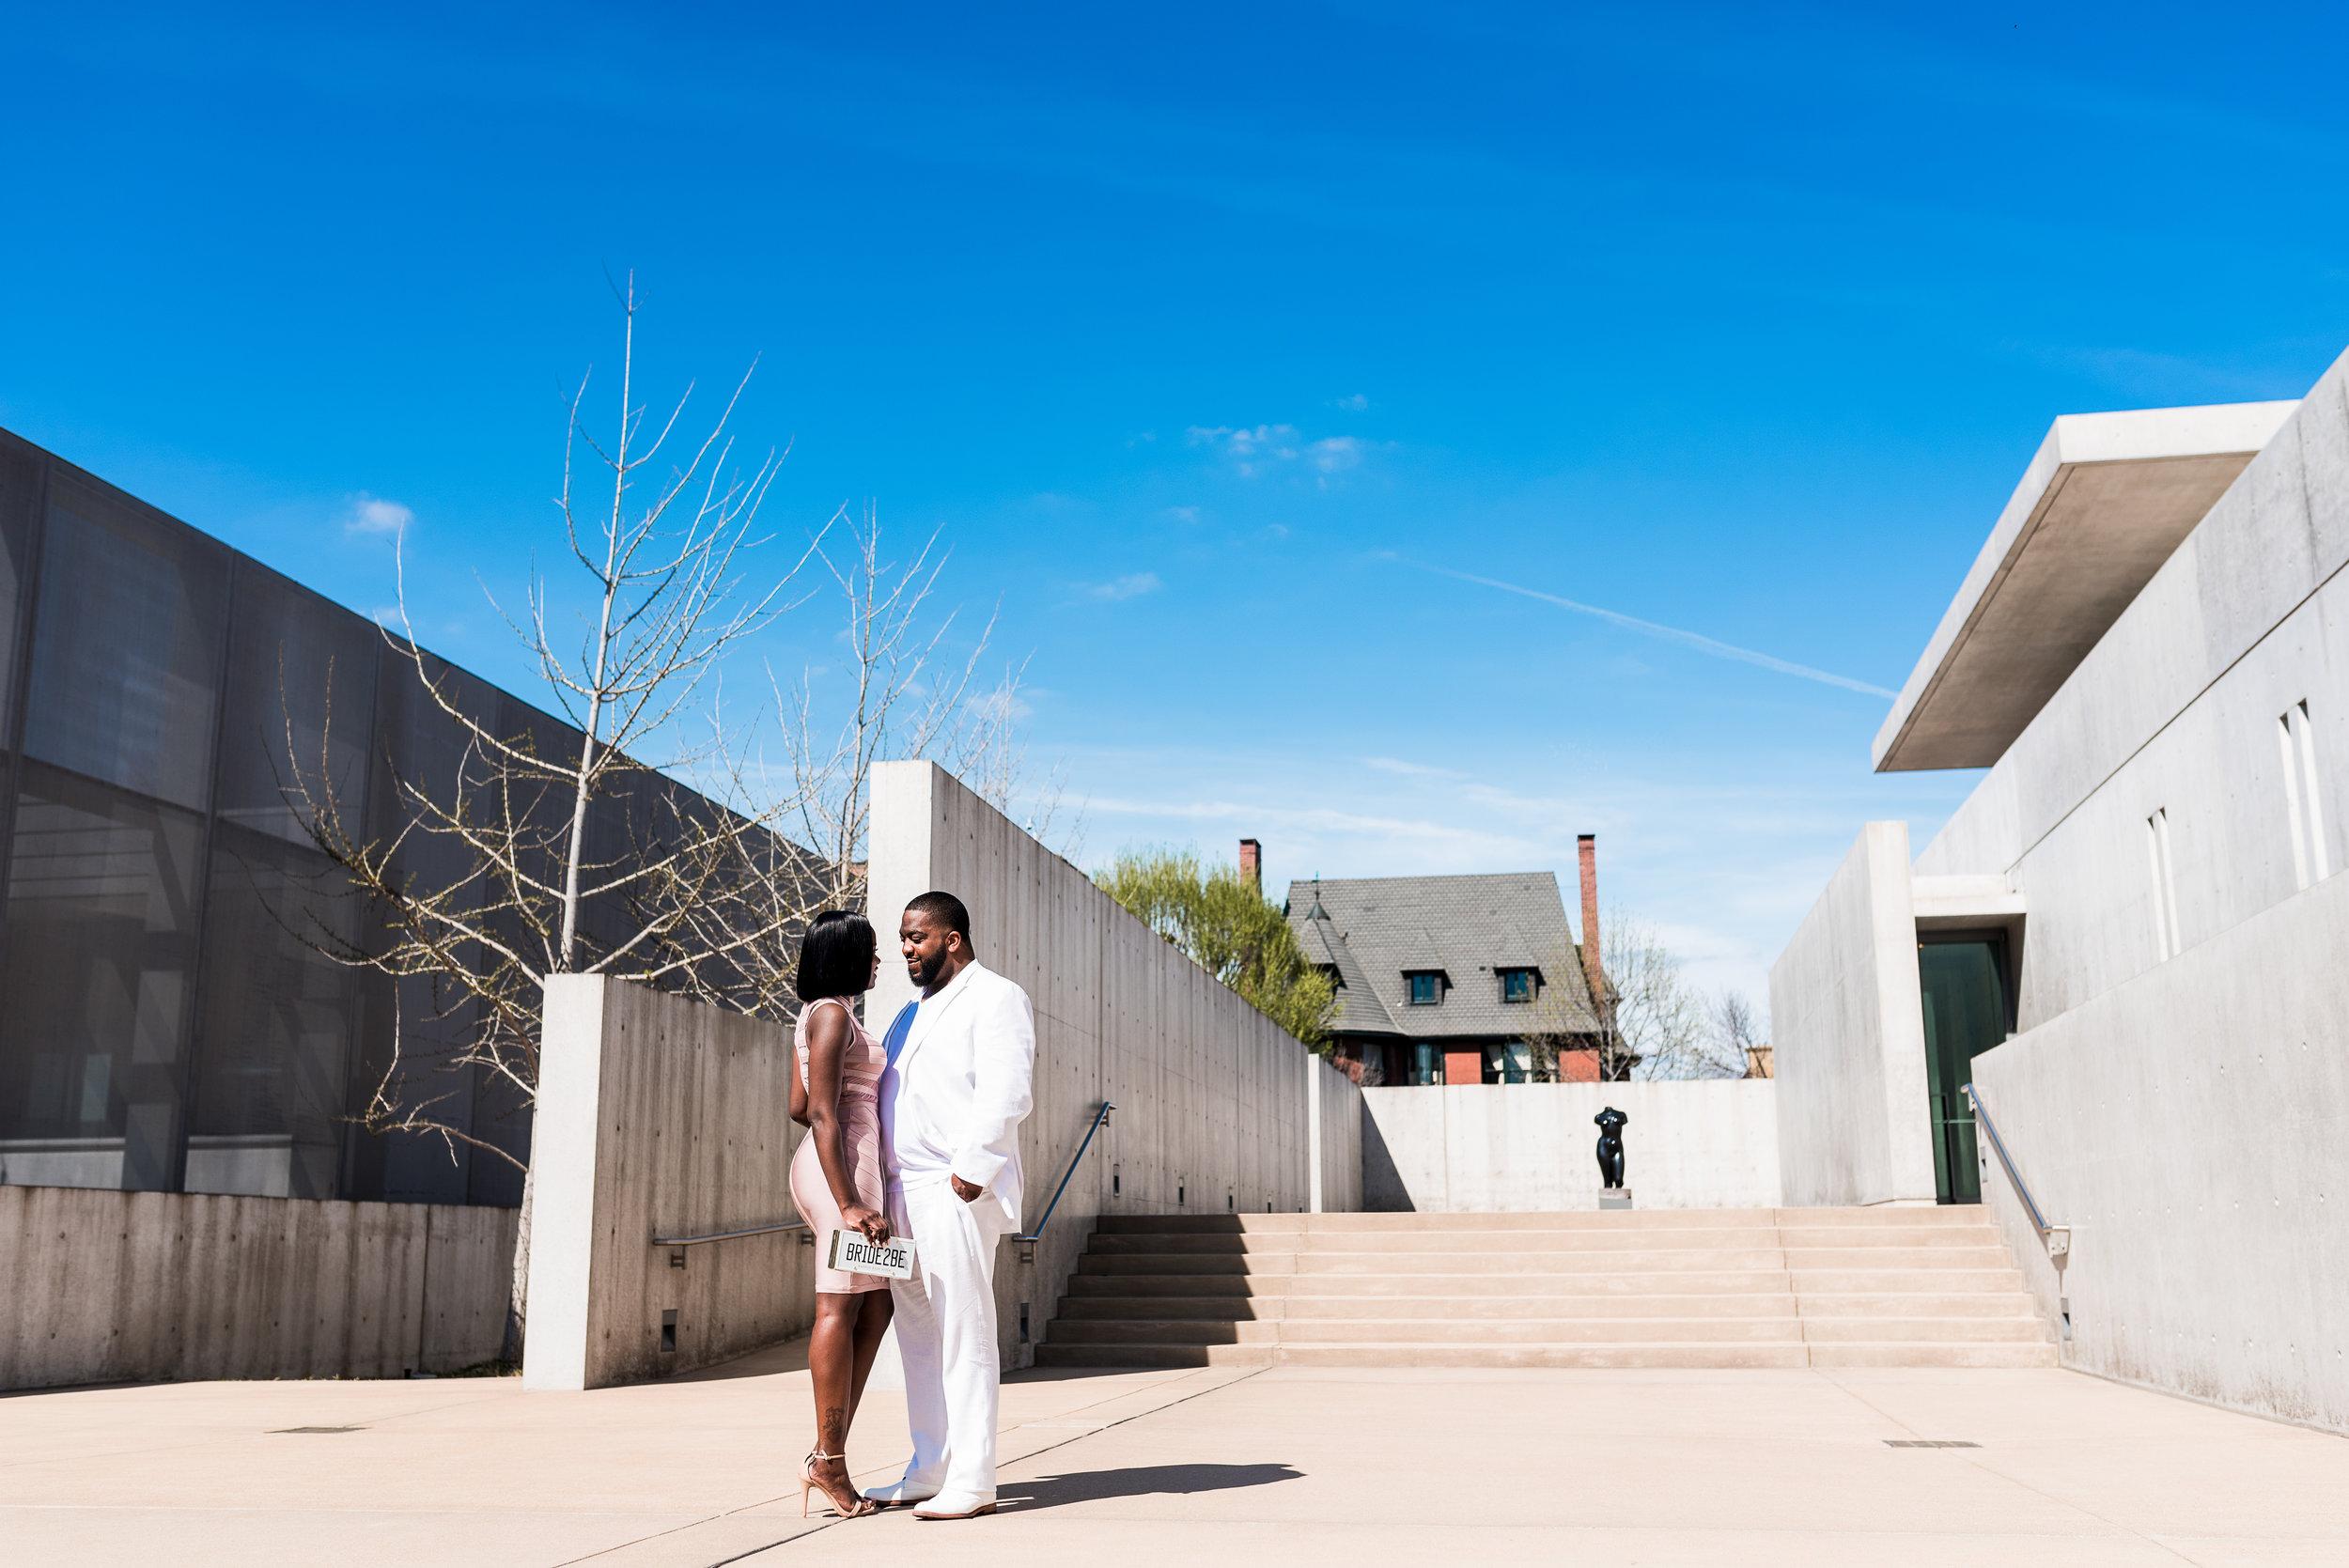 st-louis-wedding-photographer-pulitzer-arts-center-1.jpg